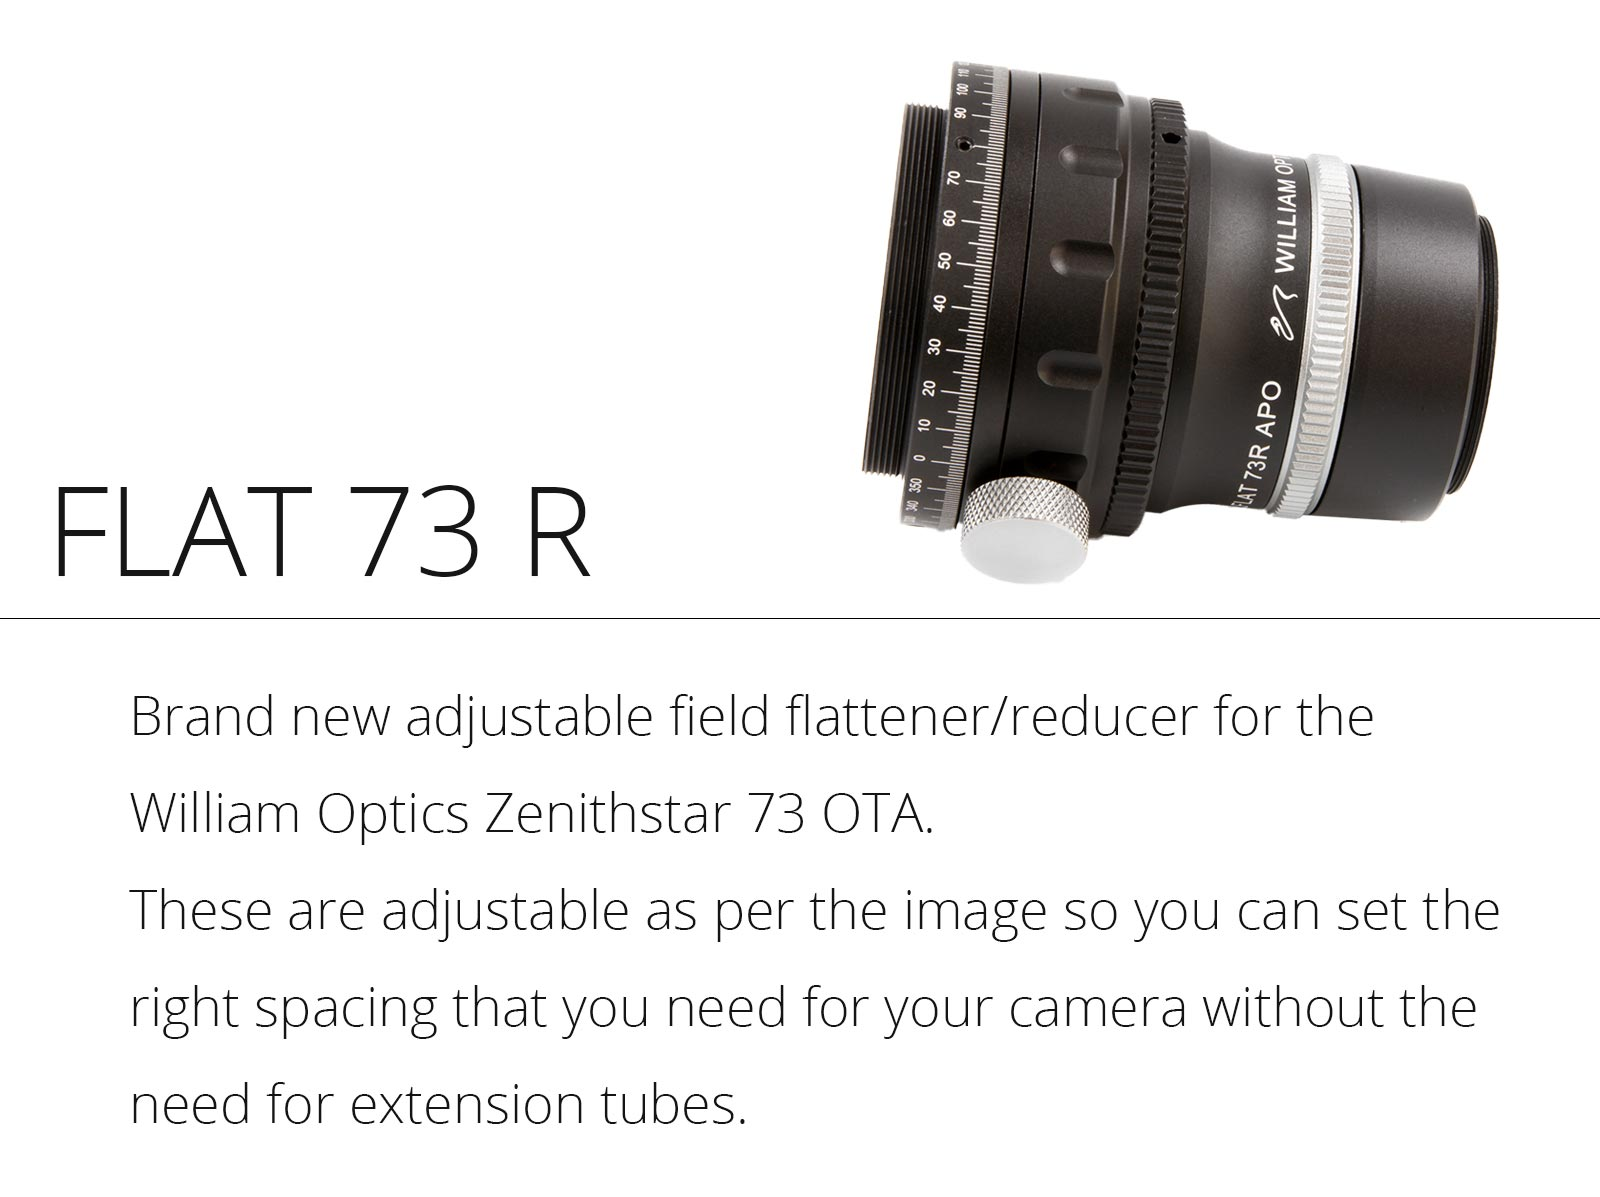 flat-73-r-2.jpg